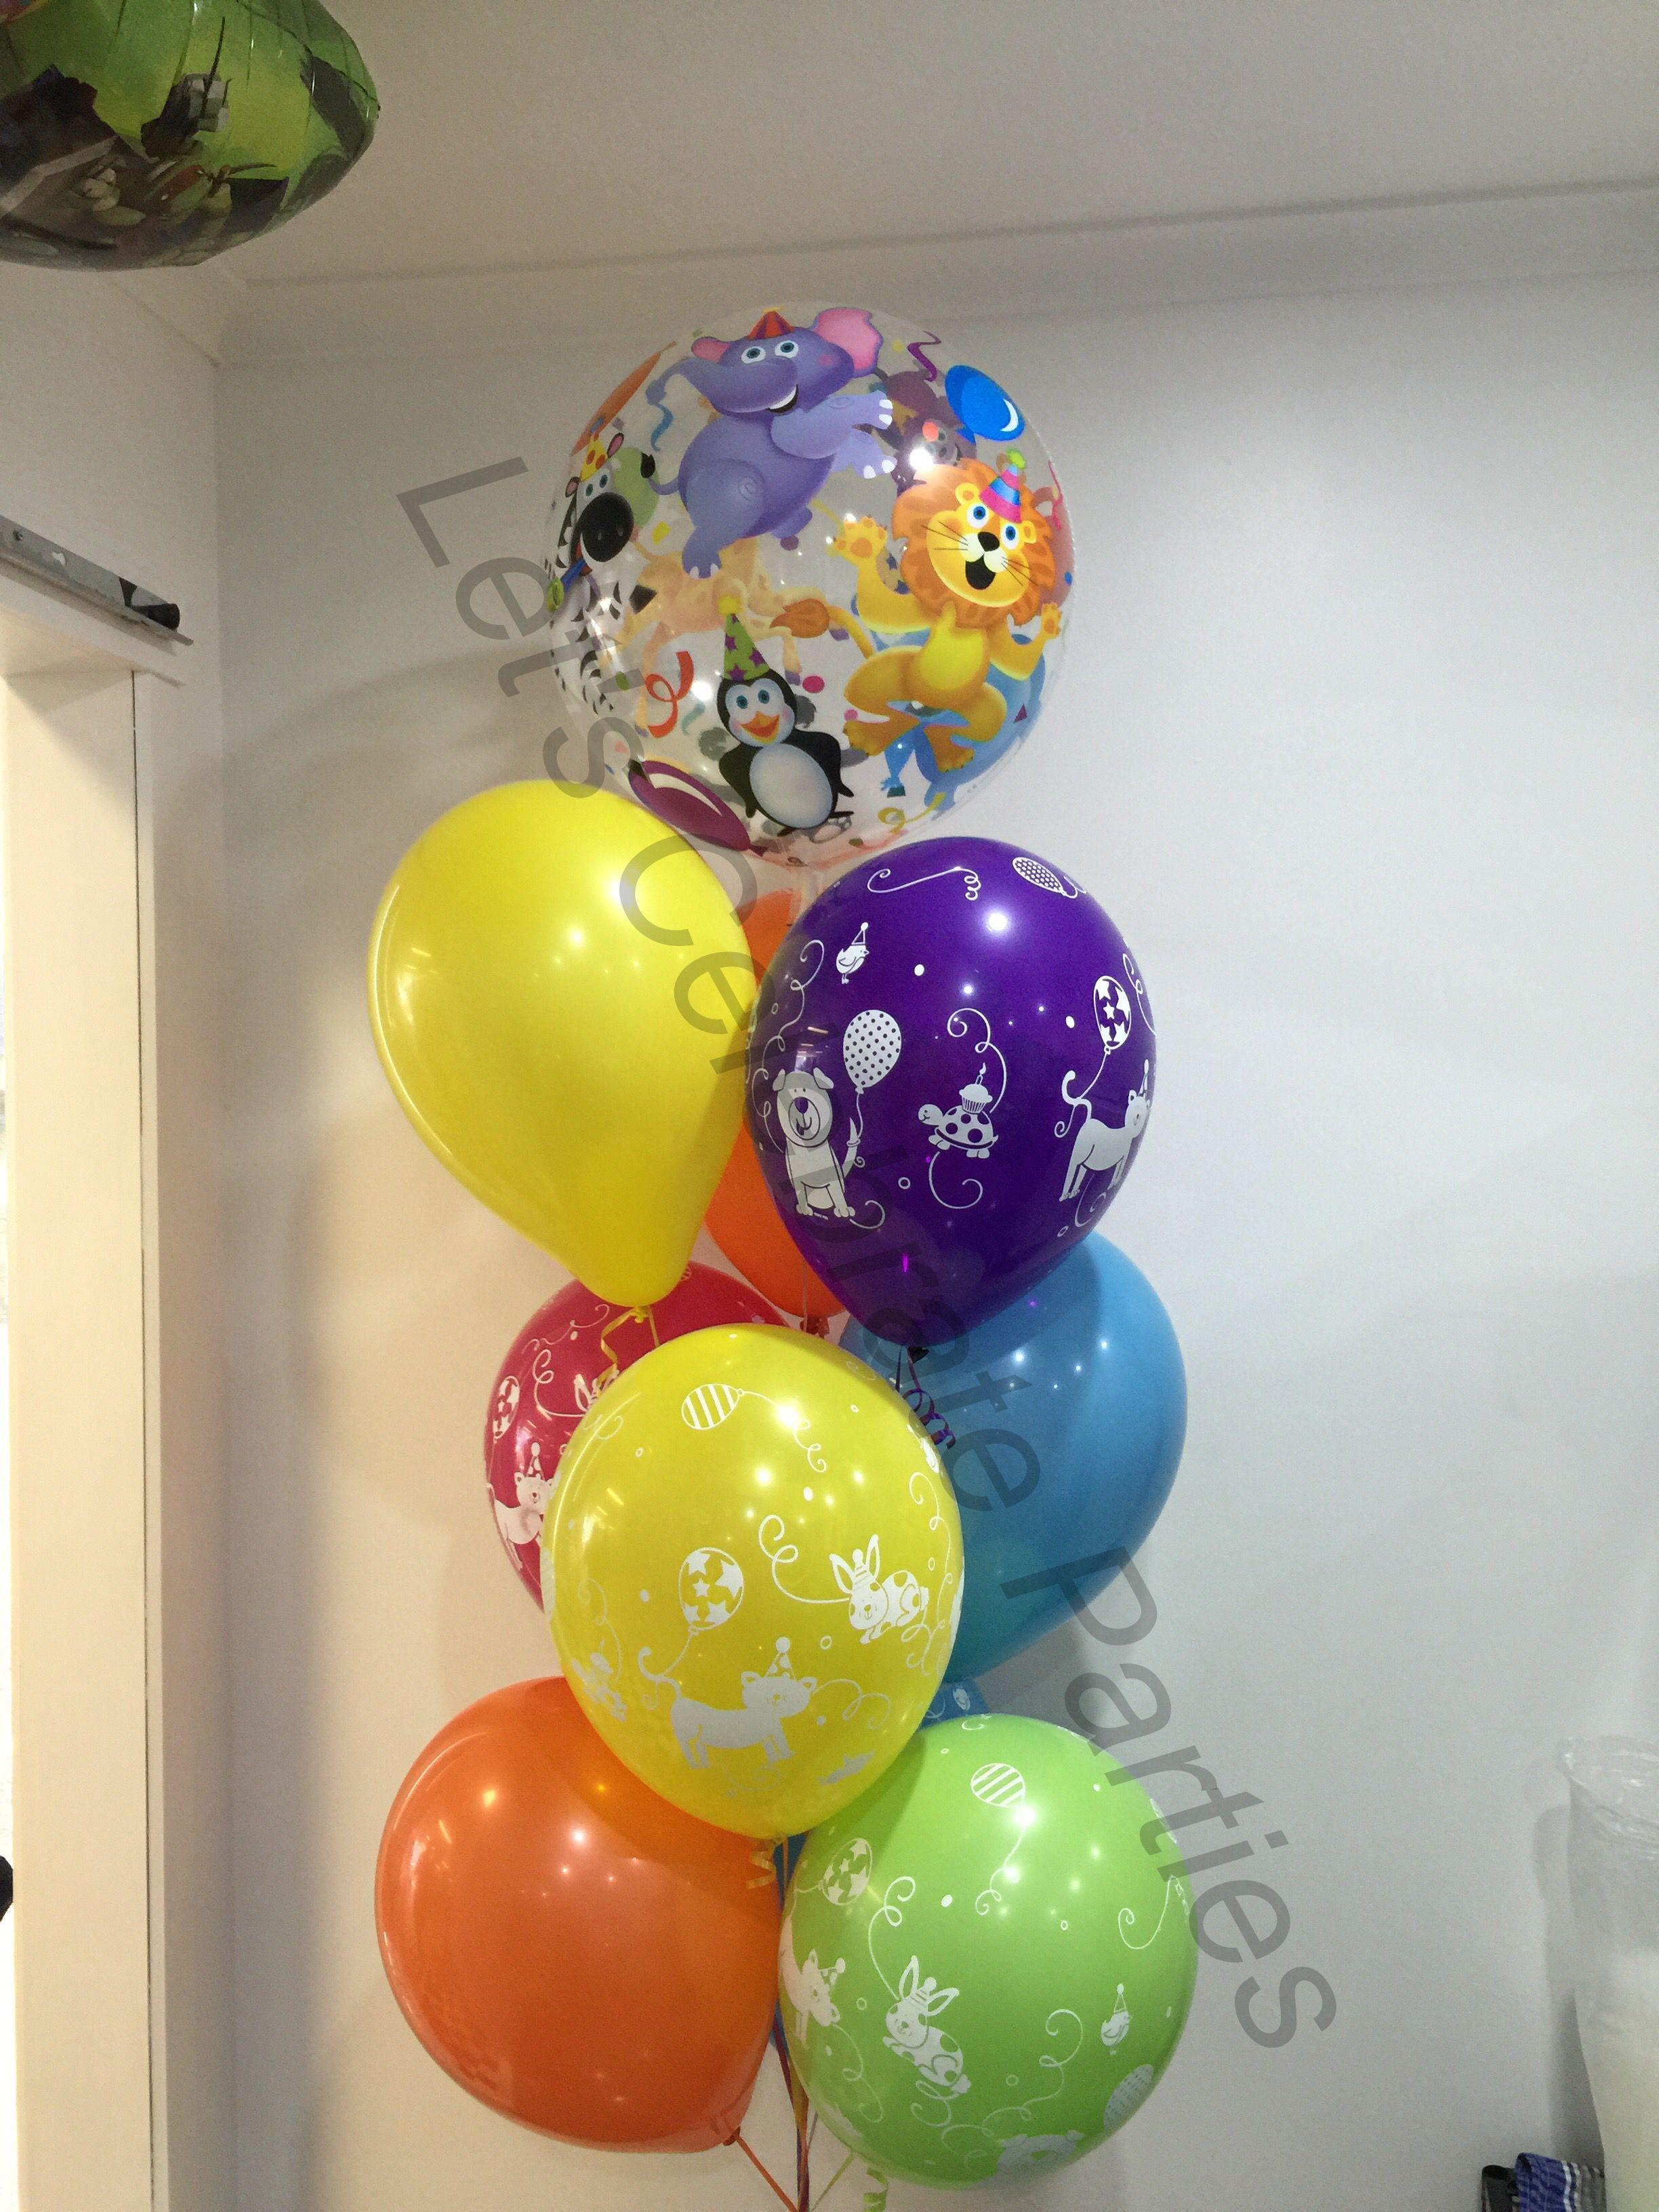 Animal balloon decoration using a balloon bubble, printed and plain ...